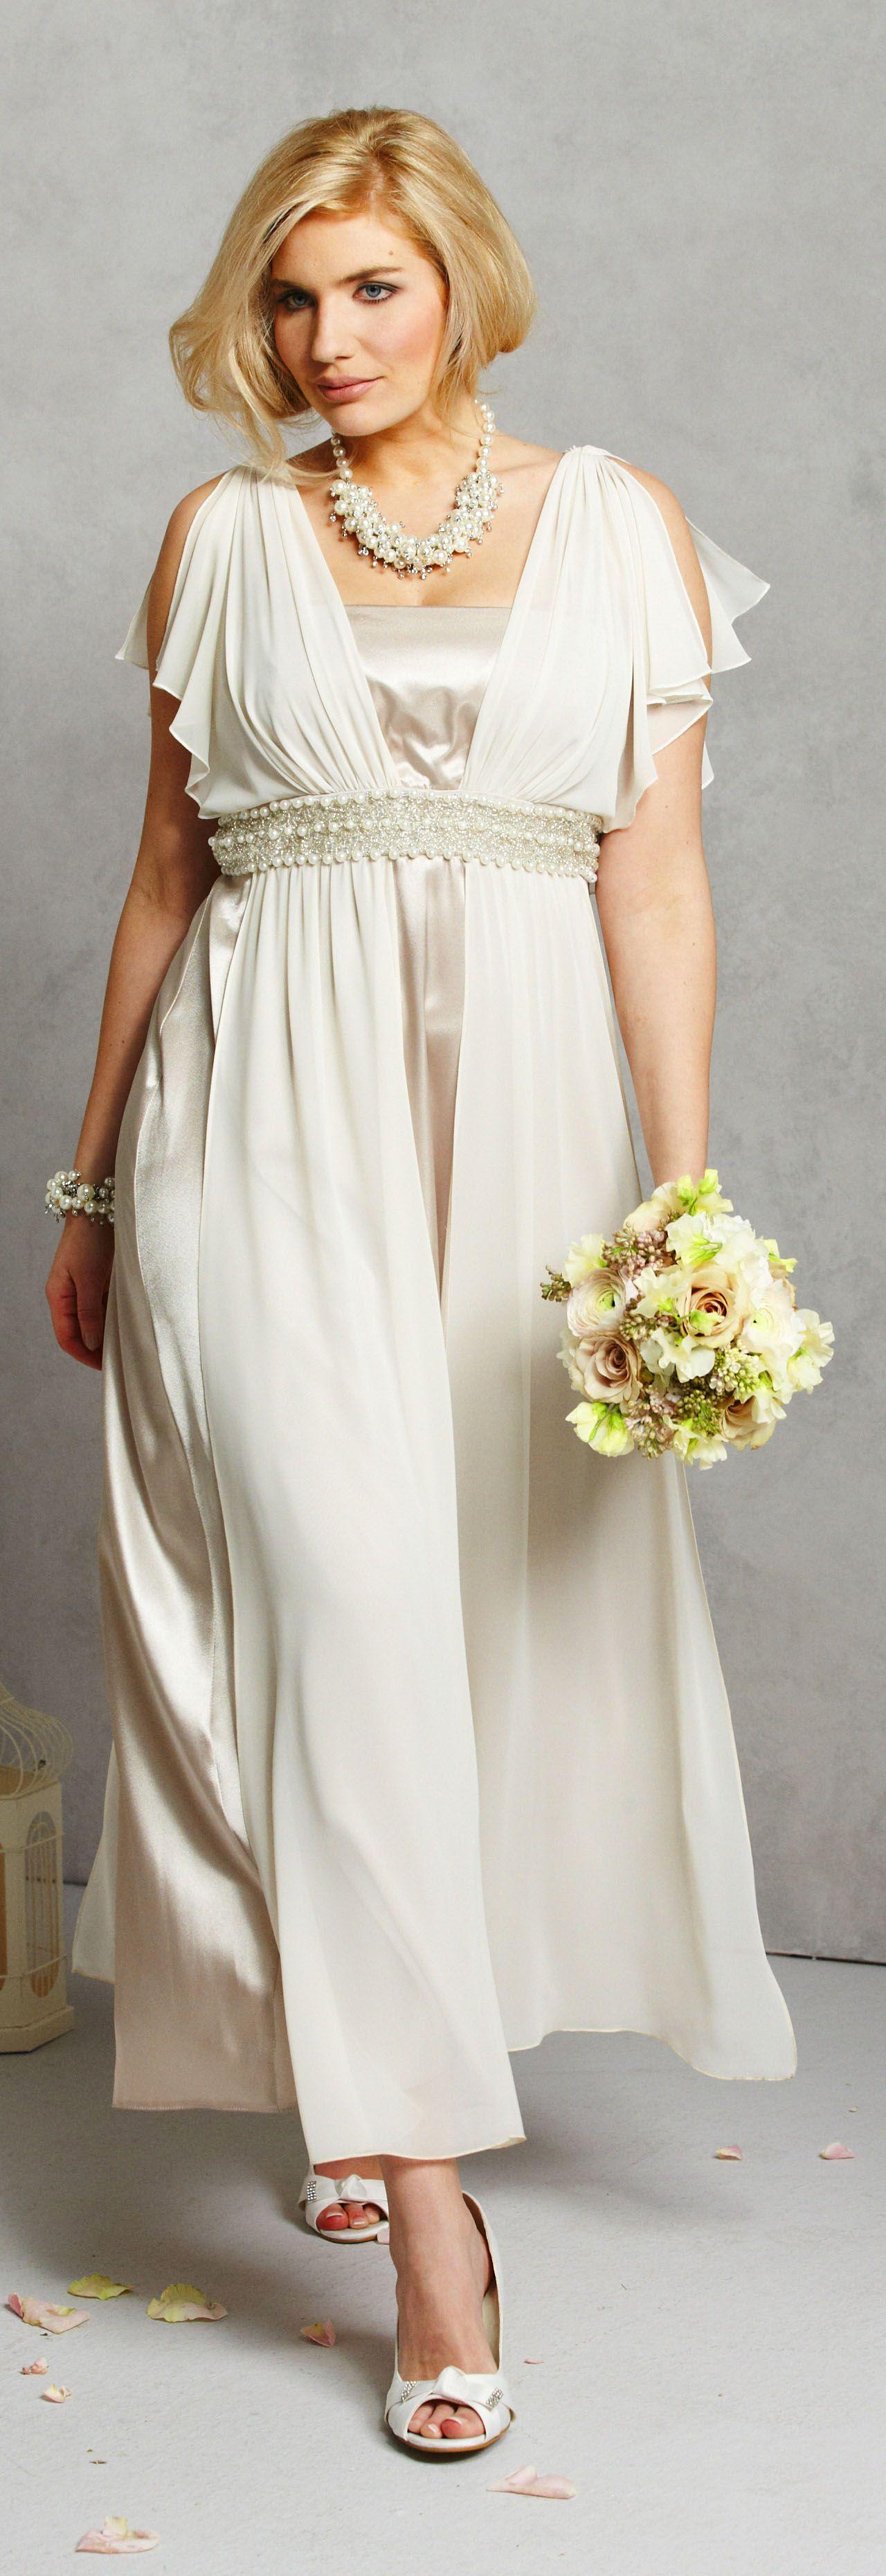 Wedding dresses for older boho brides white dresses click